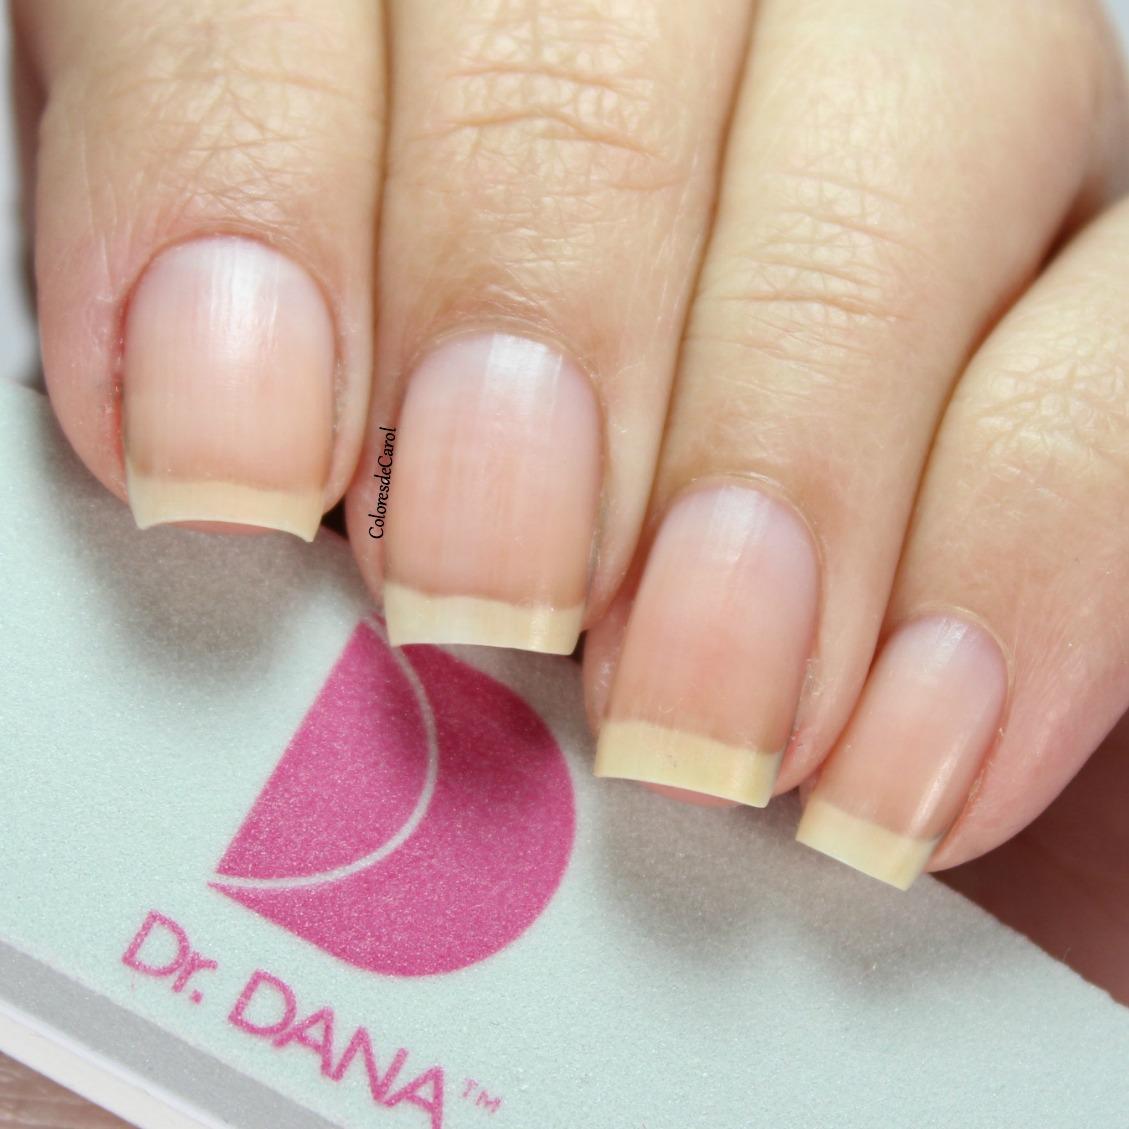 Colores de Carol: Dr. Dana - Nail Renewal System Review